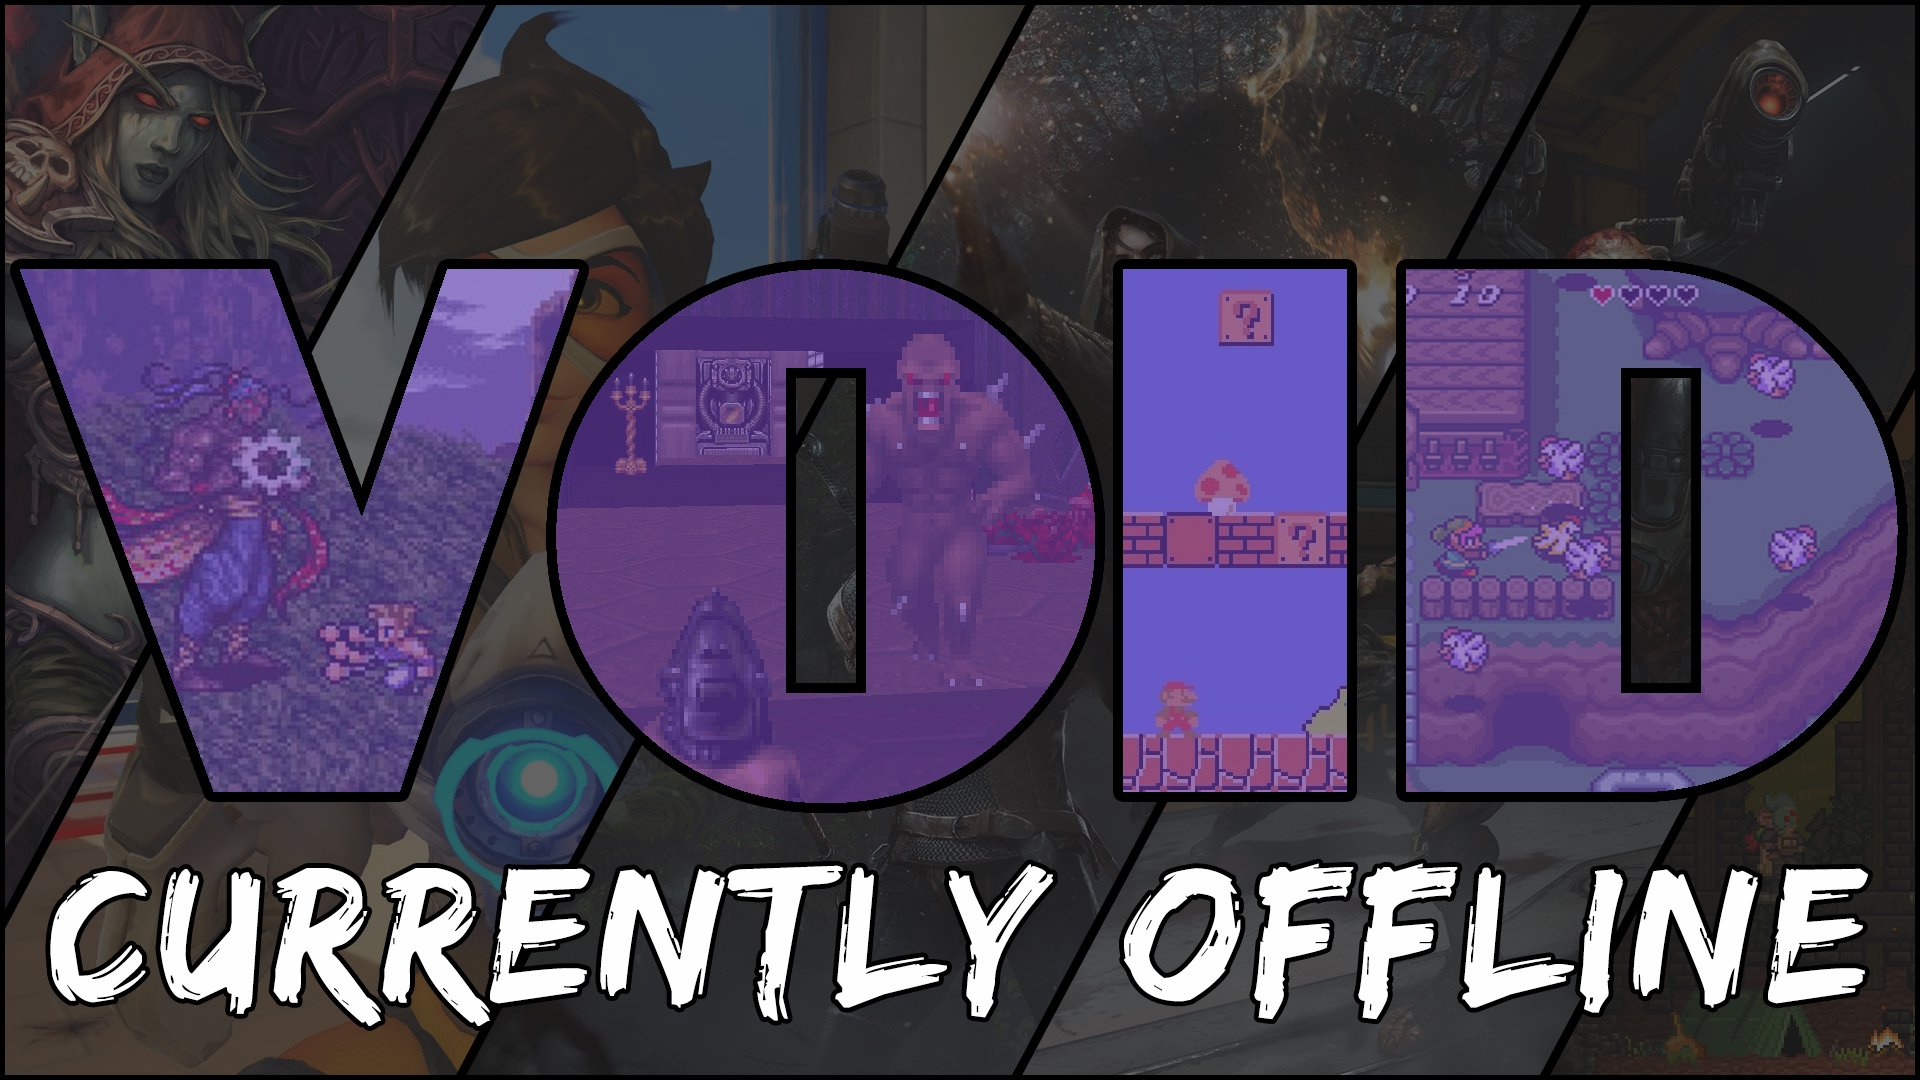 Twitch stream of void4ever